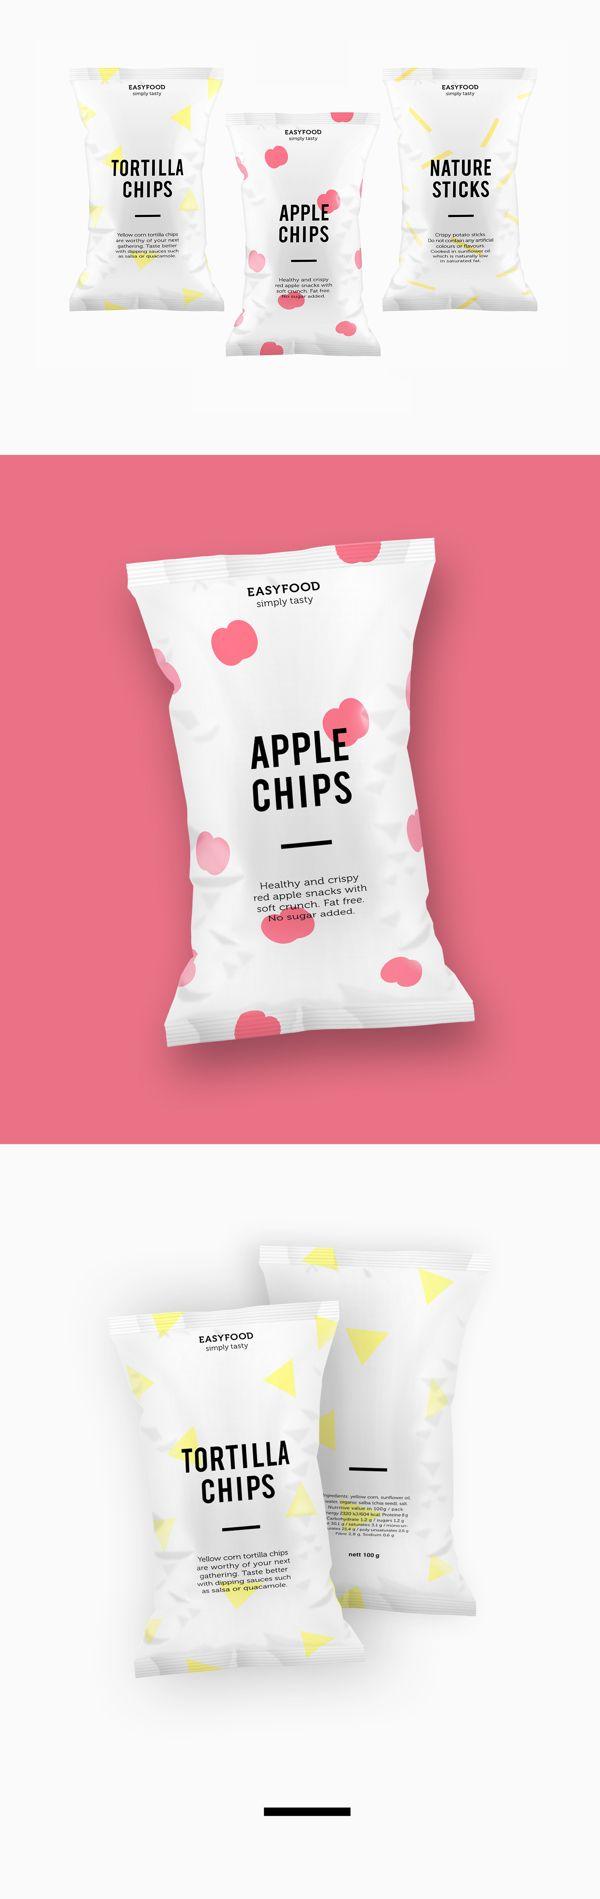 Single serve snack packaging pillow bag design